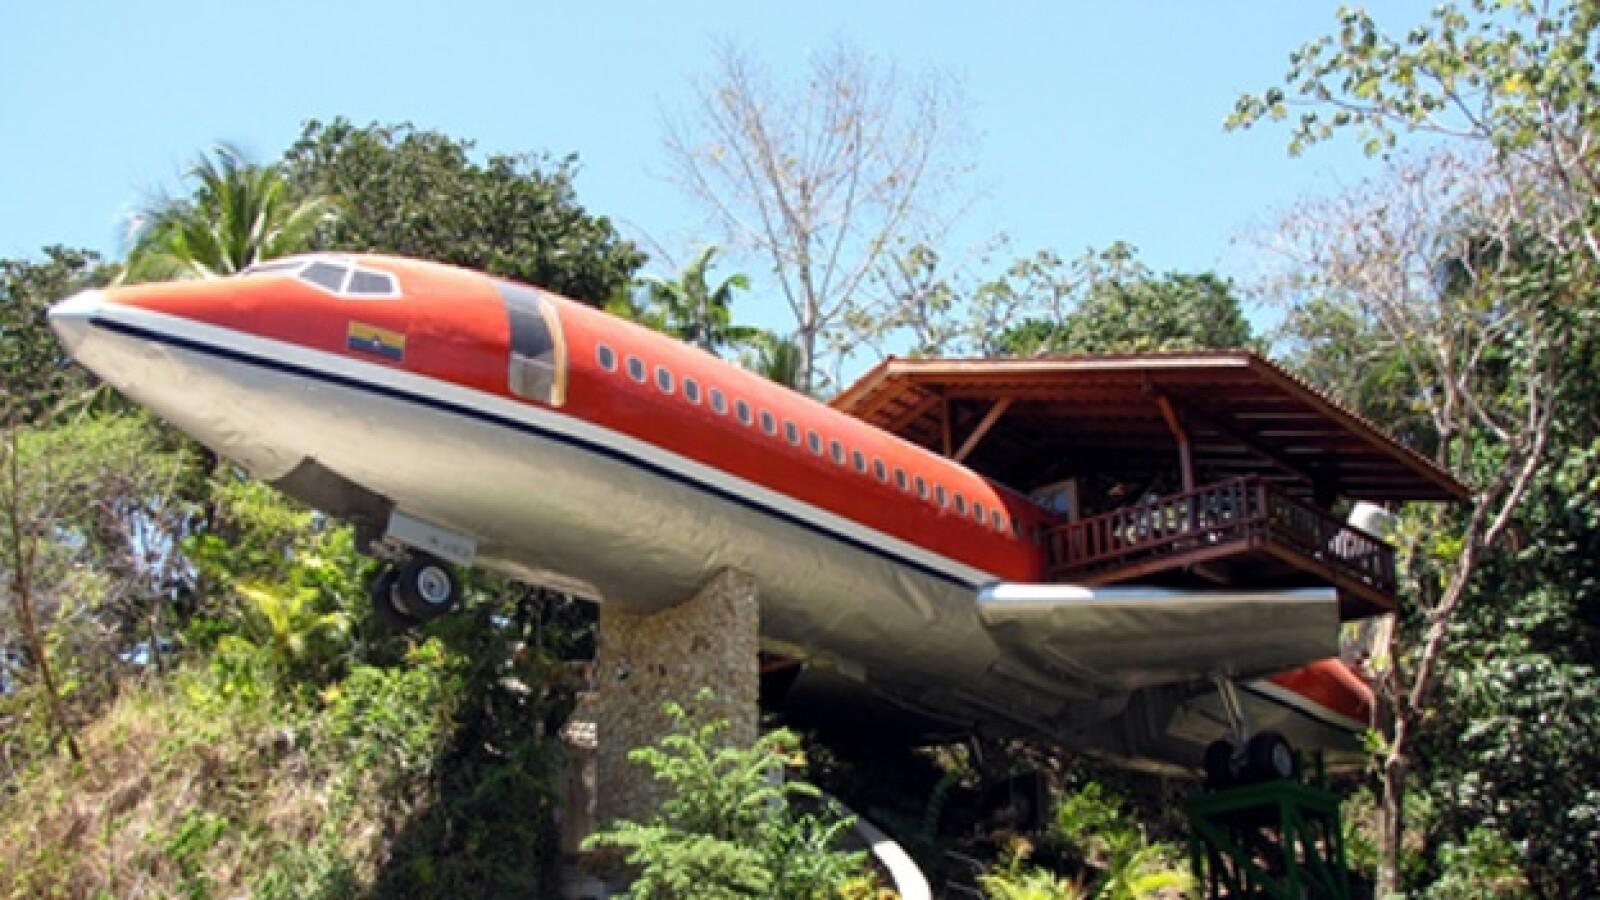 aviones, avion, reciclar, segundo aire, muebles, hotel, aeronave, retiro, chatarra